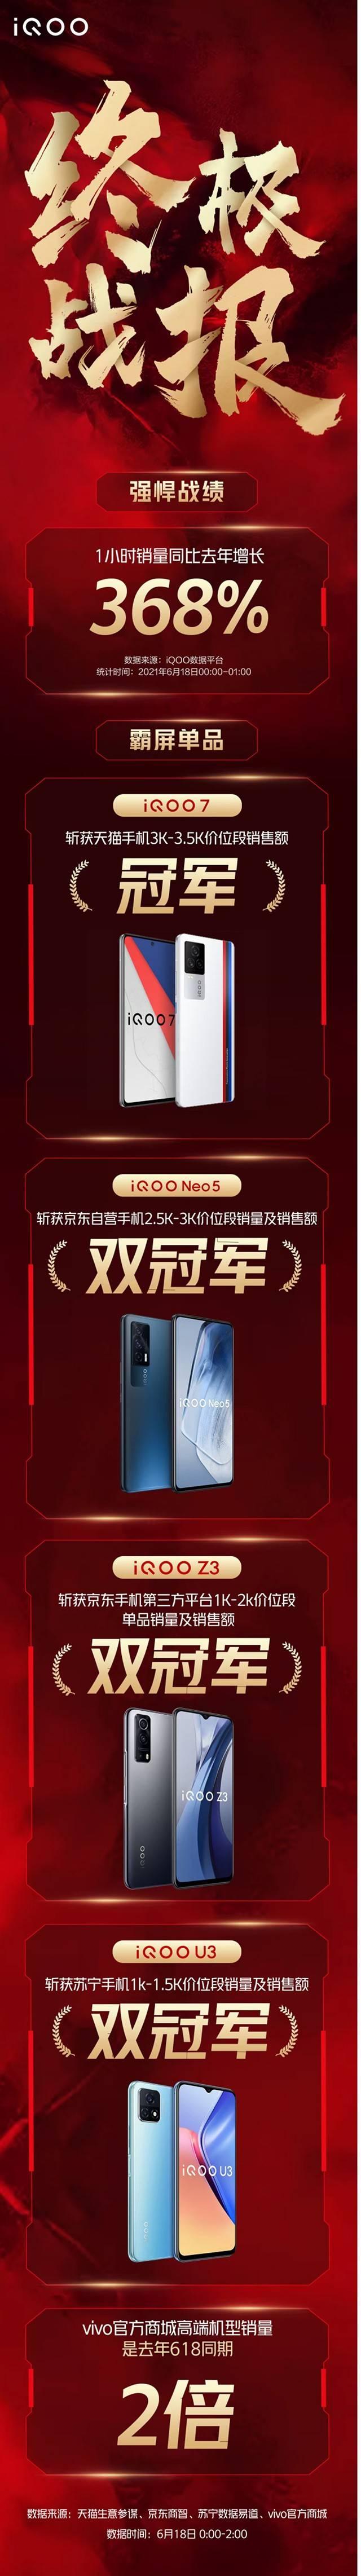 iQOO 618终极战报出炉 1小时销量同比增长368%_销售